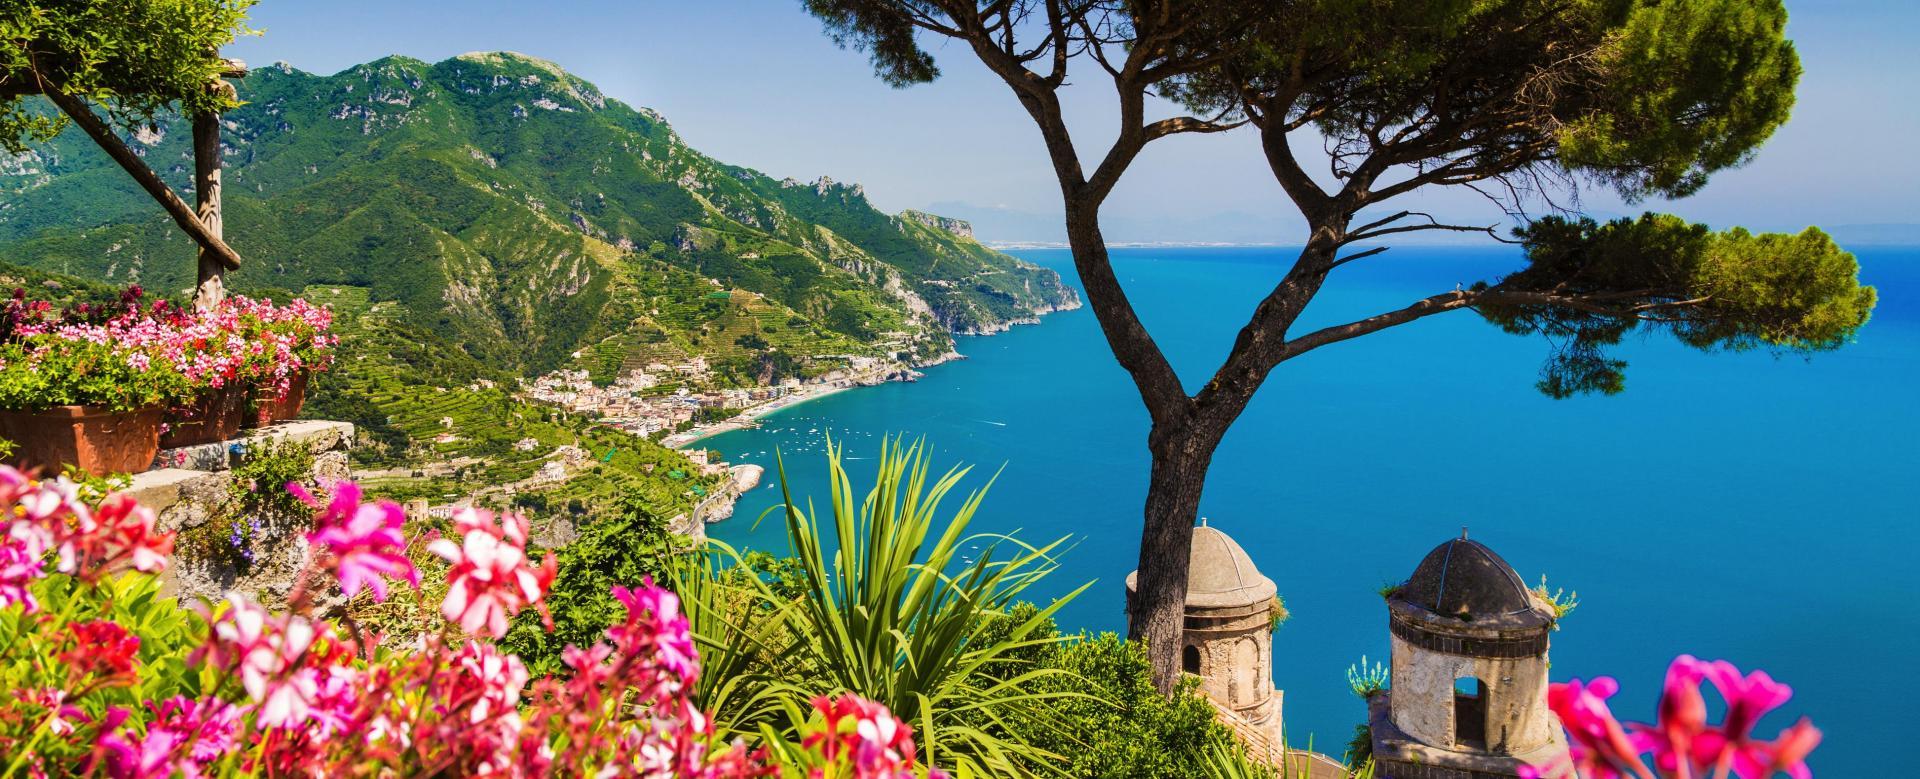 Voyage à pied Italie : Balade napolitaine